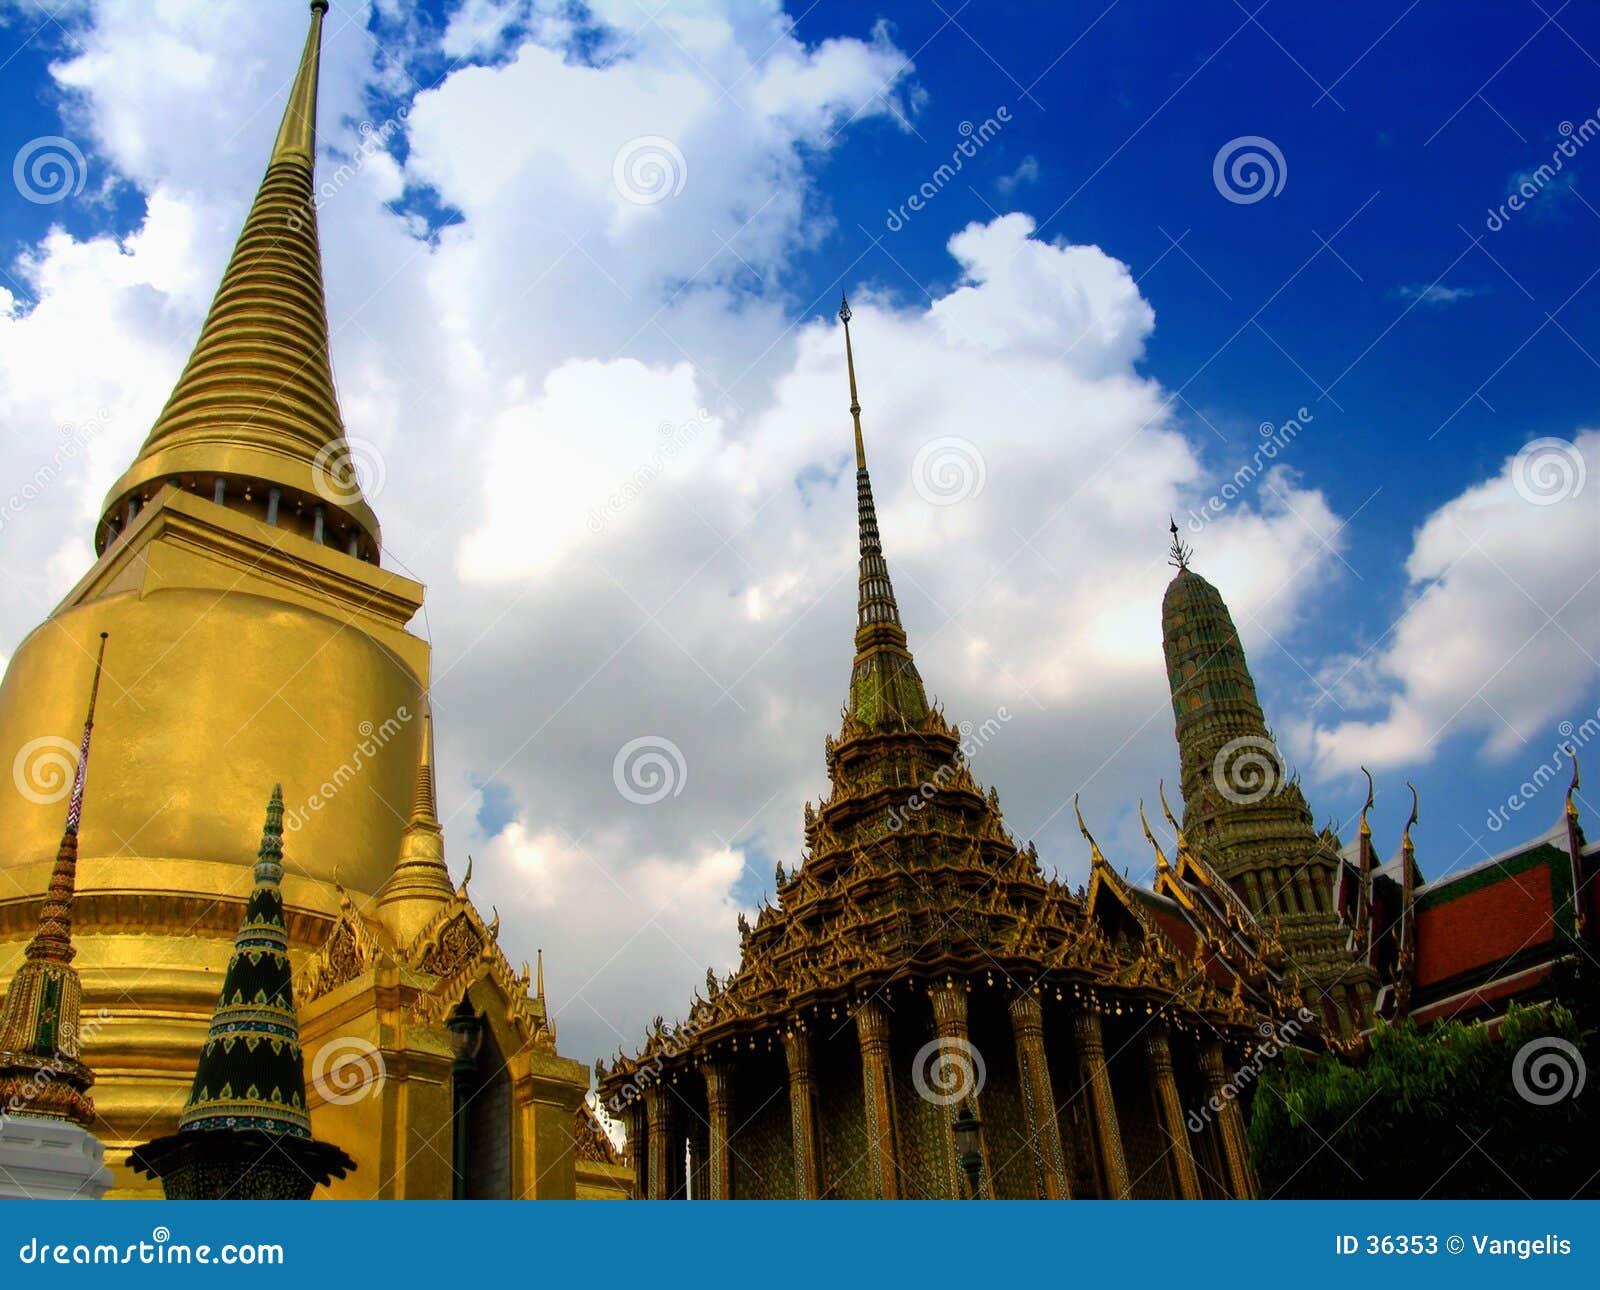 Fabulous Grand Palace and Wat Phra Kaeo - Bangkok, Thailand 1